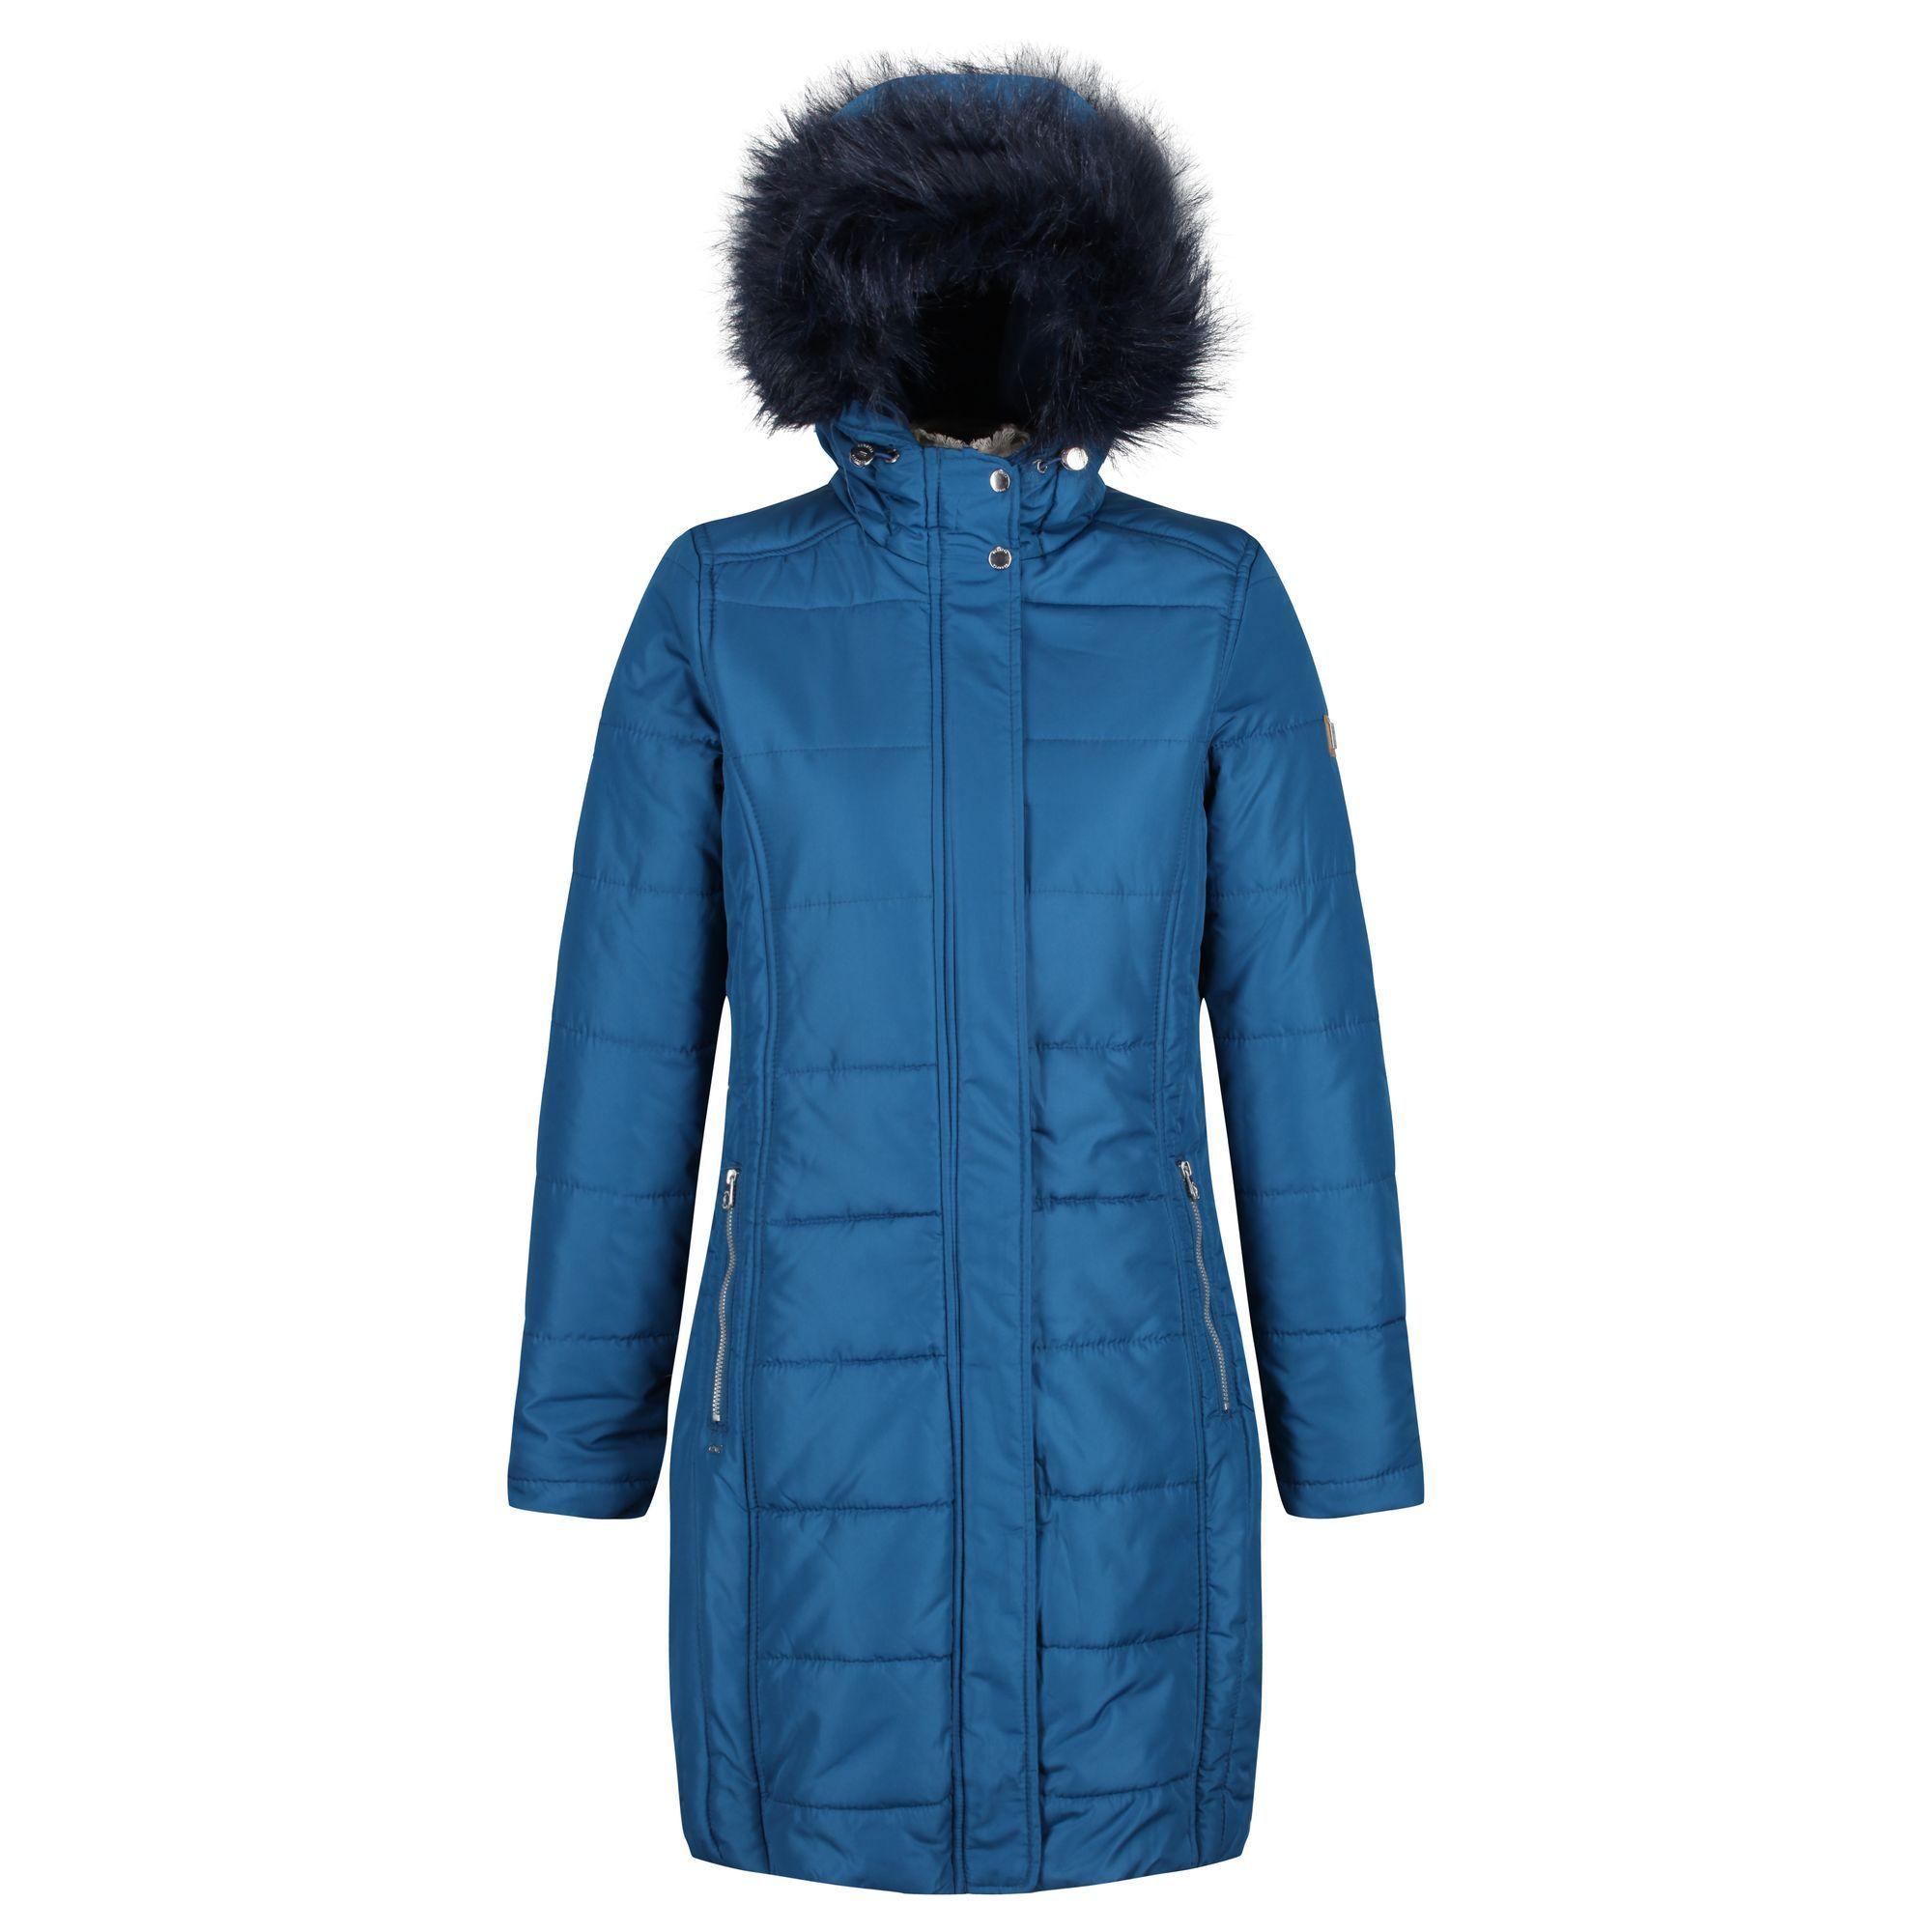 Regatta Womens/Ladies Fermina II Quilted Hooded Parka Jacket